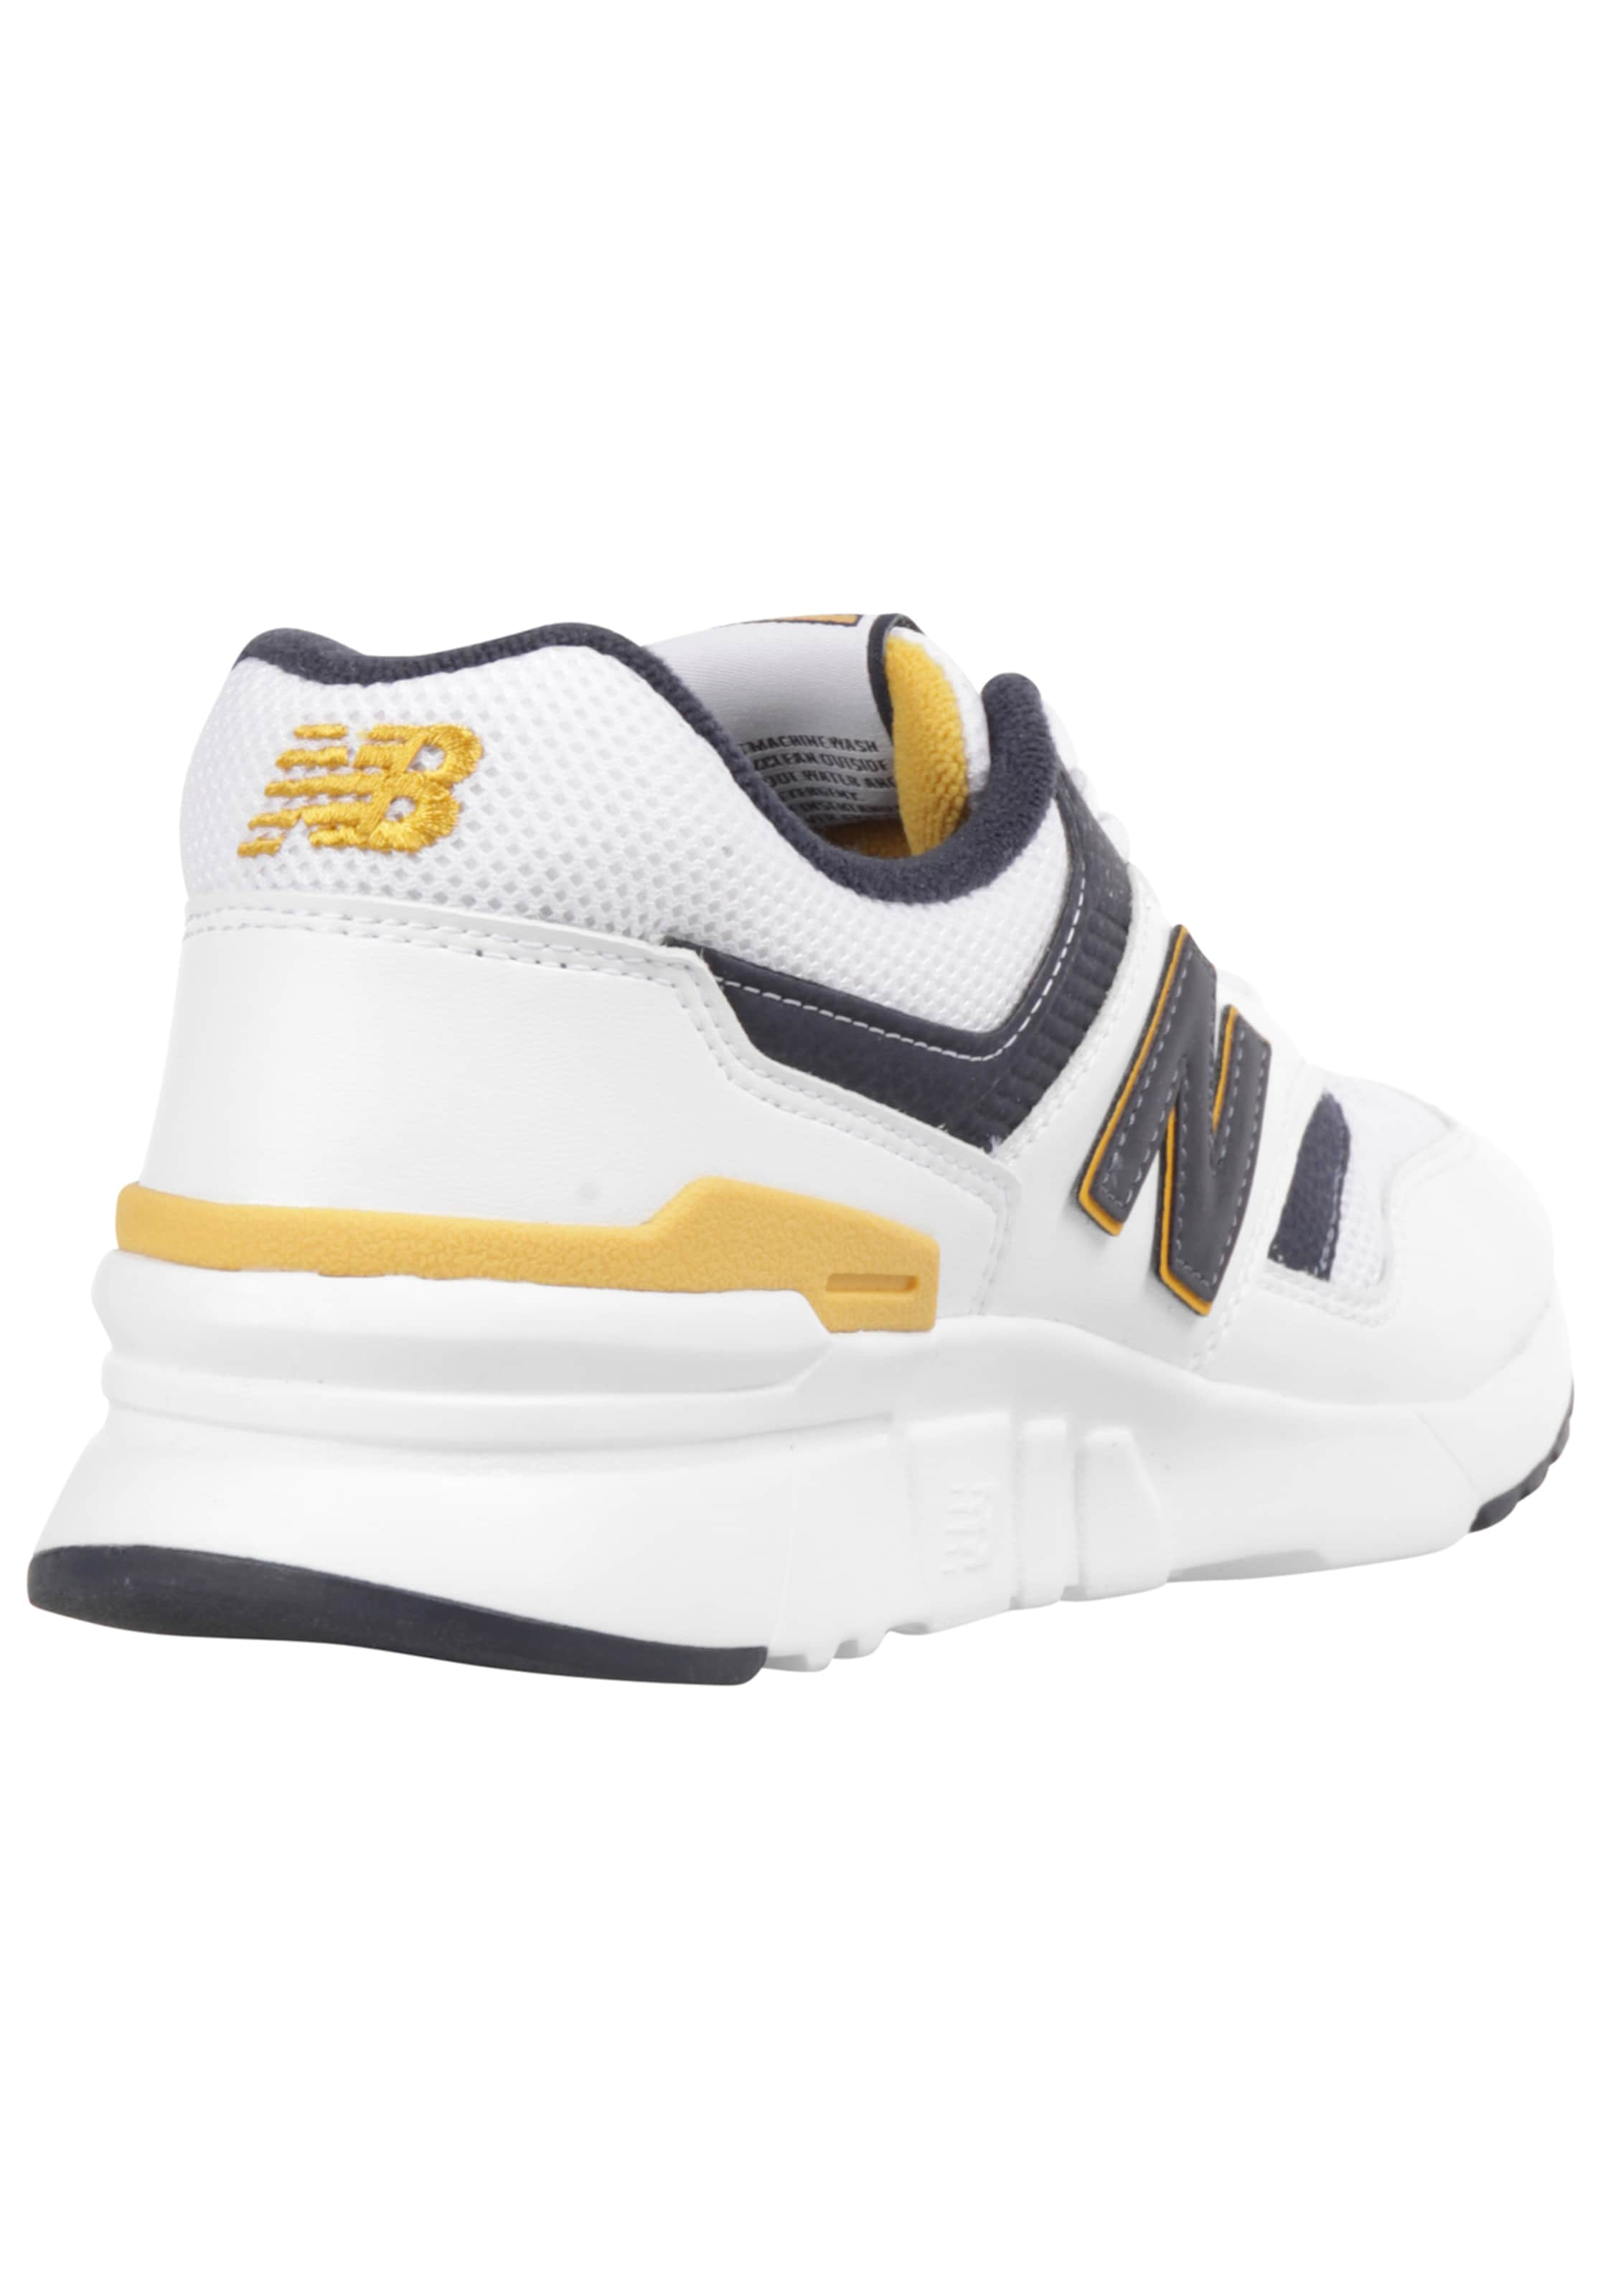 Balance DunkelblauDunkelgelb In Weiß Sneaker New PXTlwOikZu